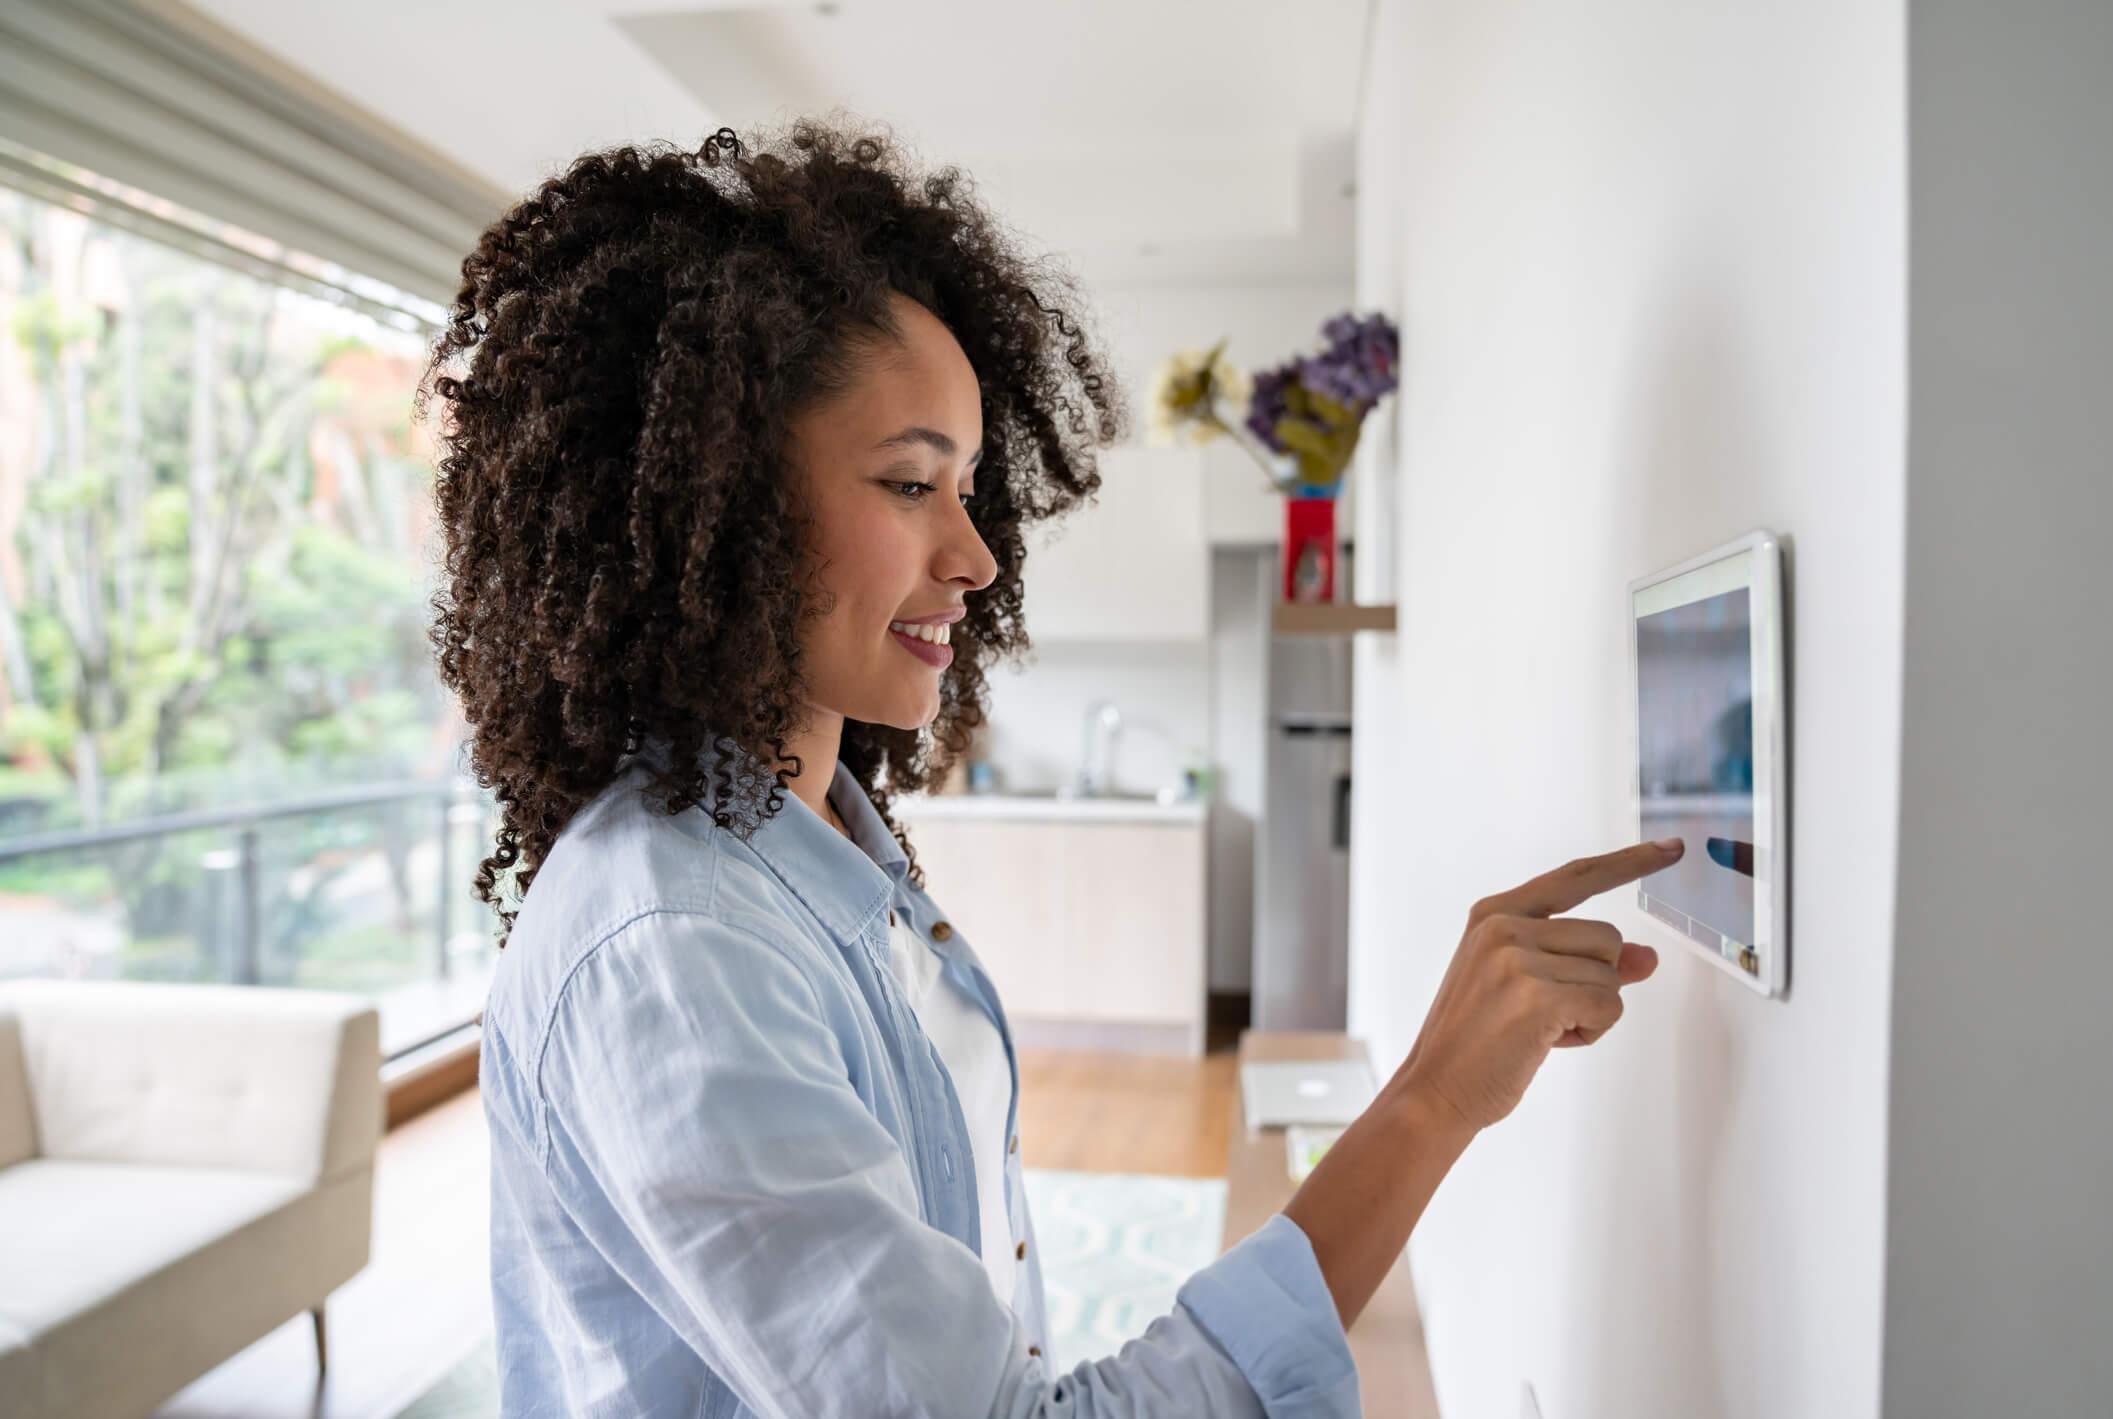 Woman adjusts smart home settings on a wall panel